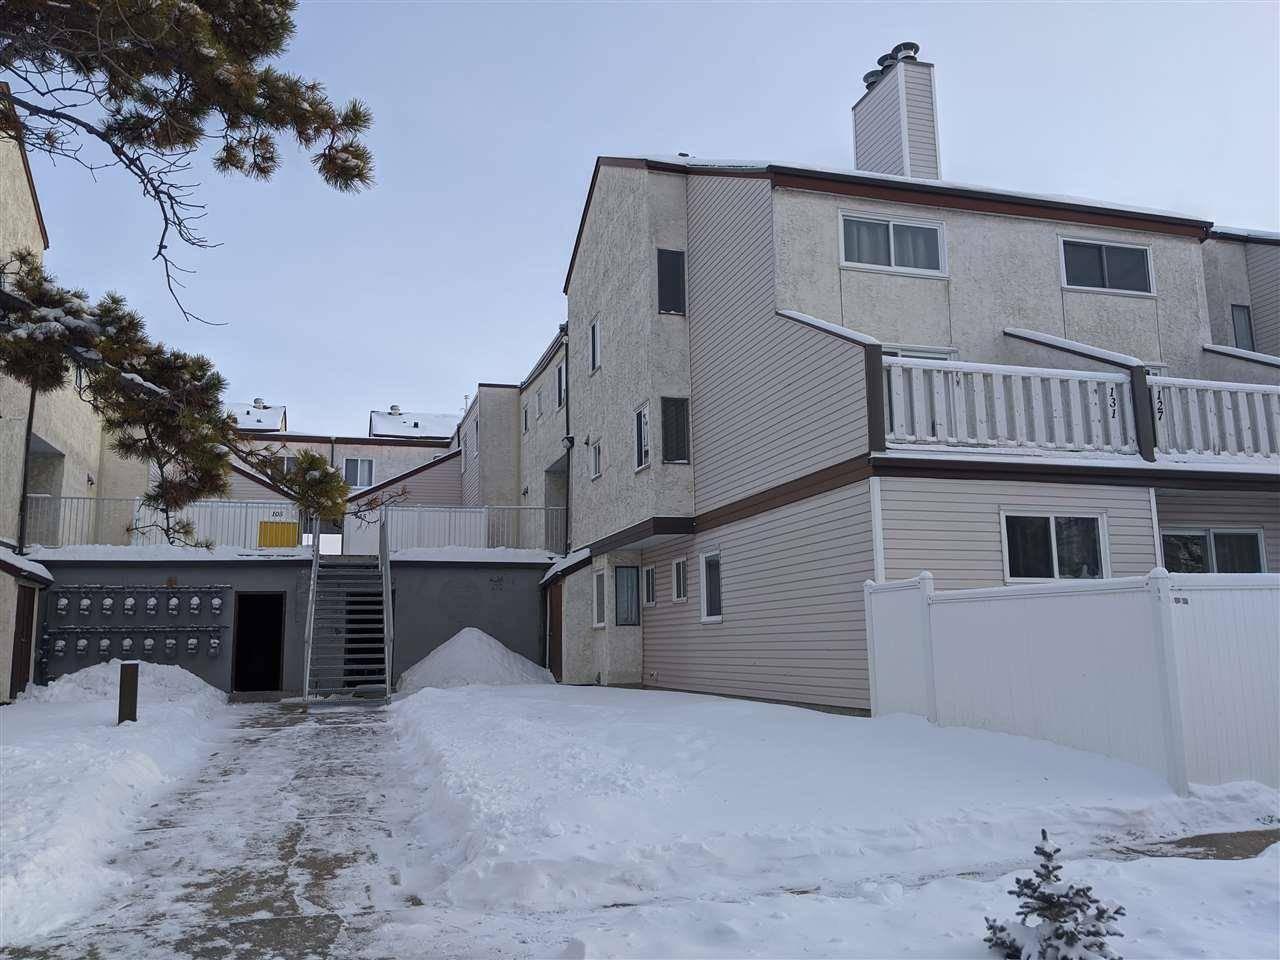 Townhouse for sale at 143 Lancaster Te Nw Edmonton Alberta - MLS: E4183850